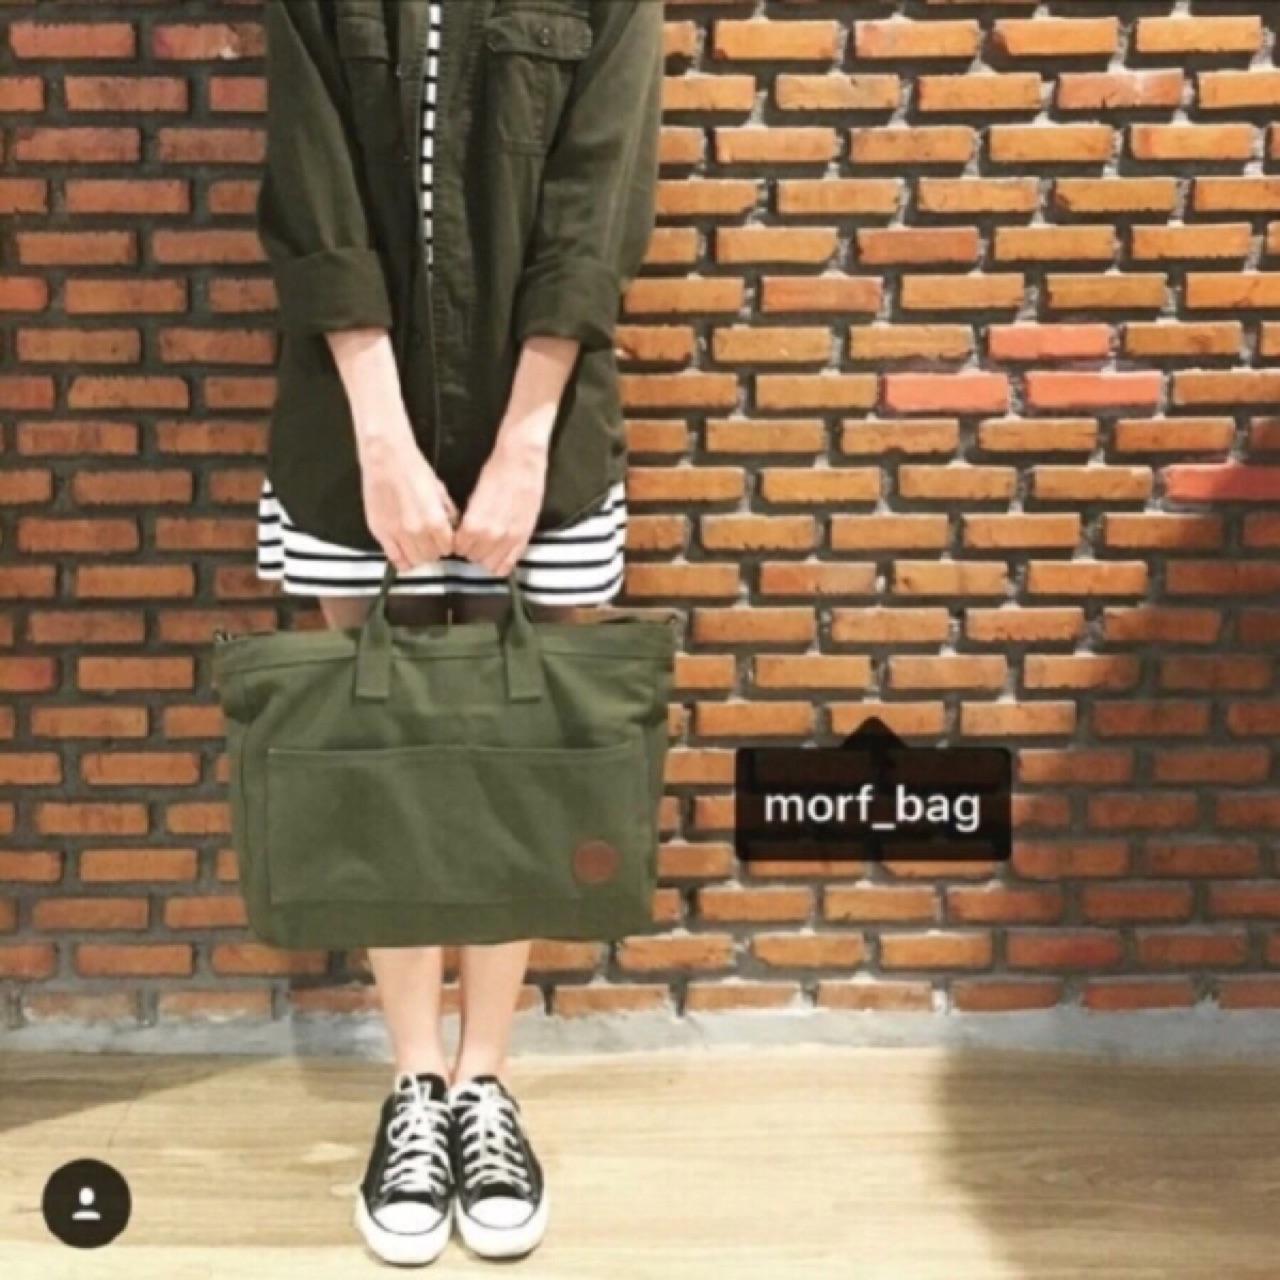 minimal,minimalstyle,hipster,กระเป๋าใส่โน๊ตบุ๊ค,กระเป๋าใส่โน้ตบุ้ค,กระเป๋าใส่โน้ตบุ๊ค,กระเป๋า,กระเป๋าถือ,กระเป๋าเอกสาร